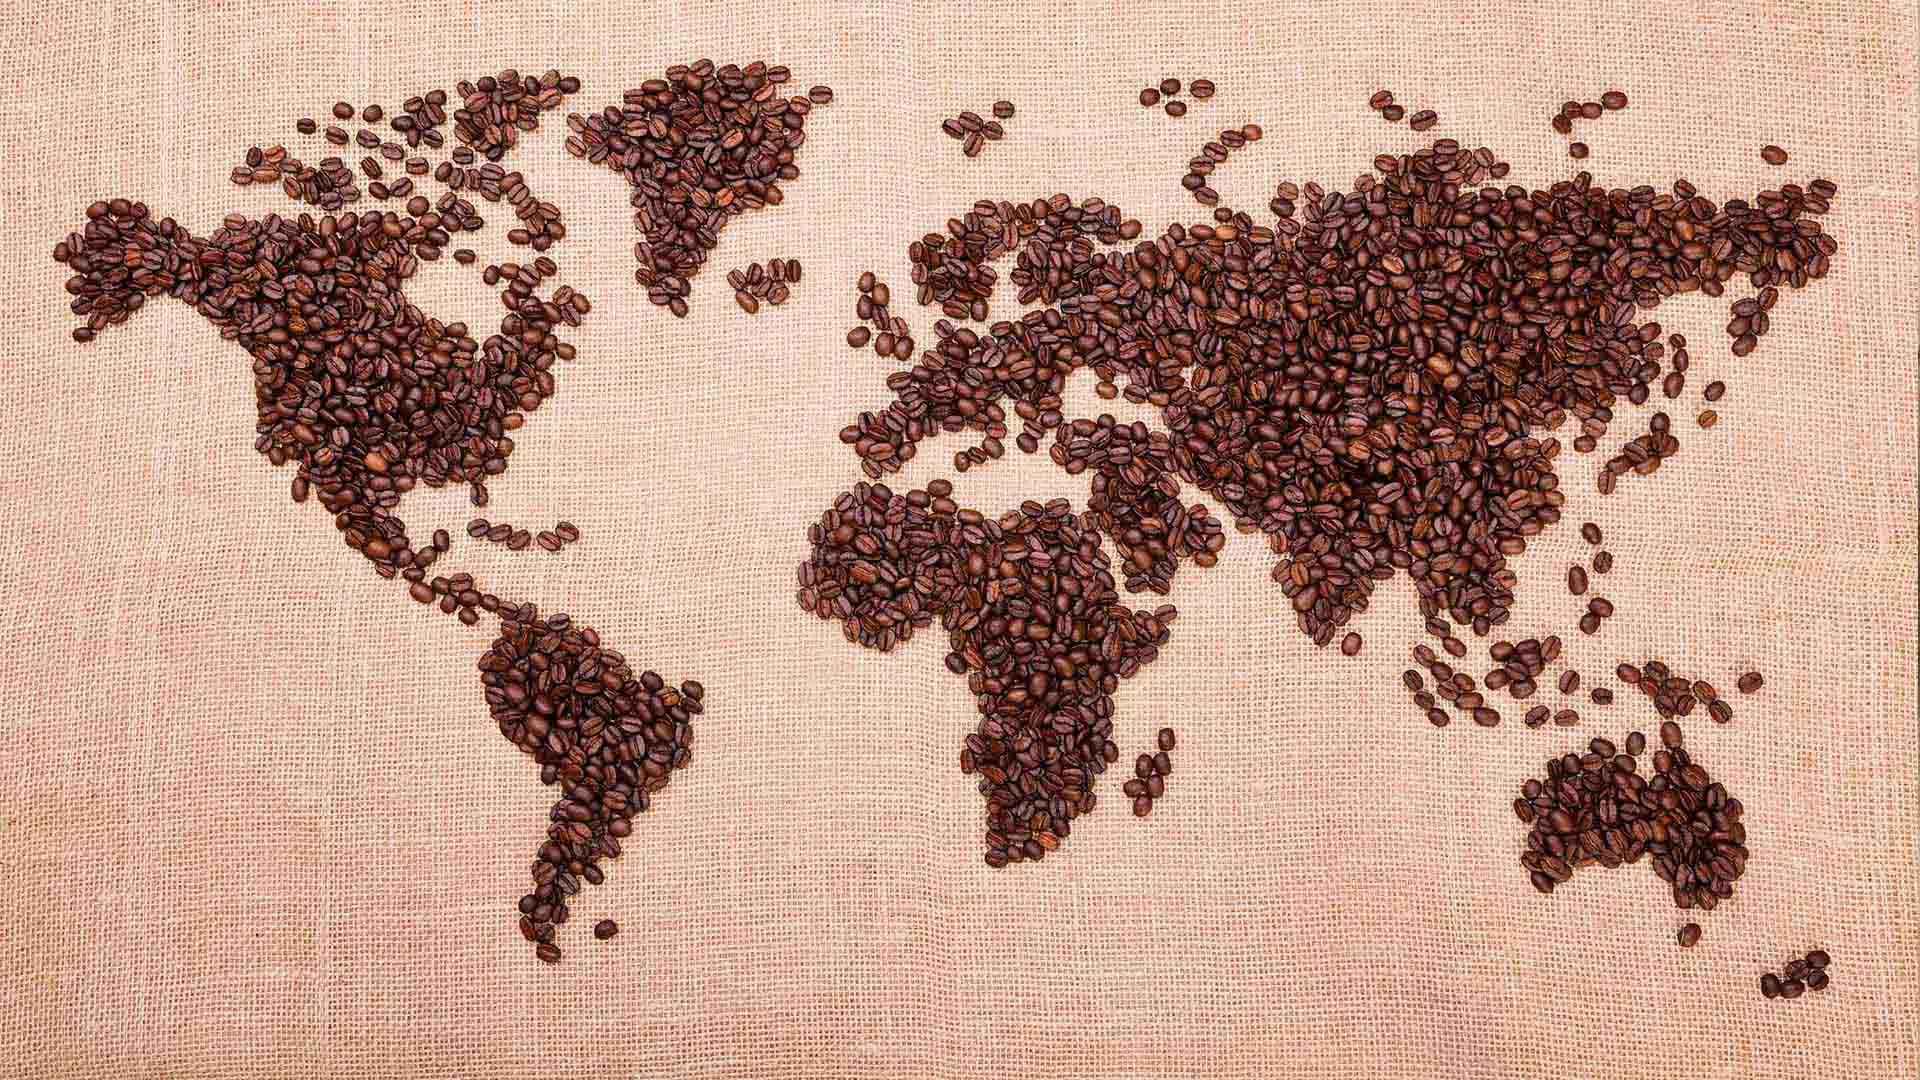 urban-nutters-coffee-world